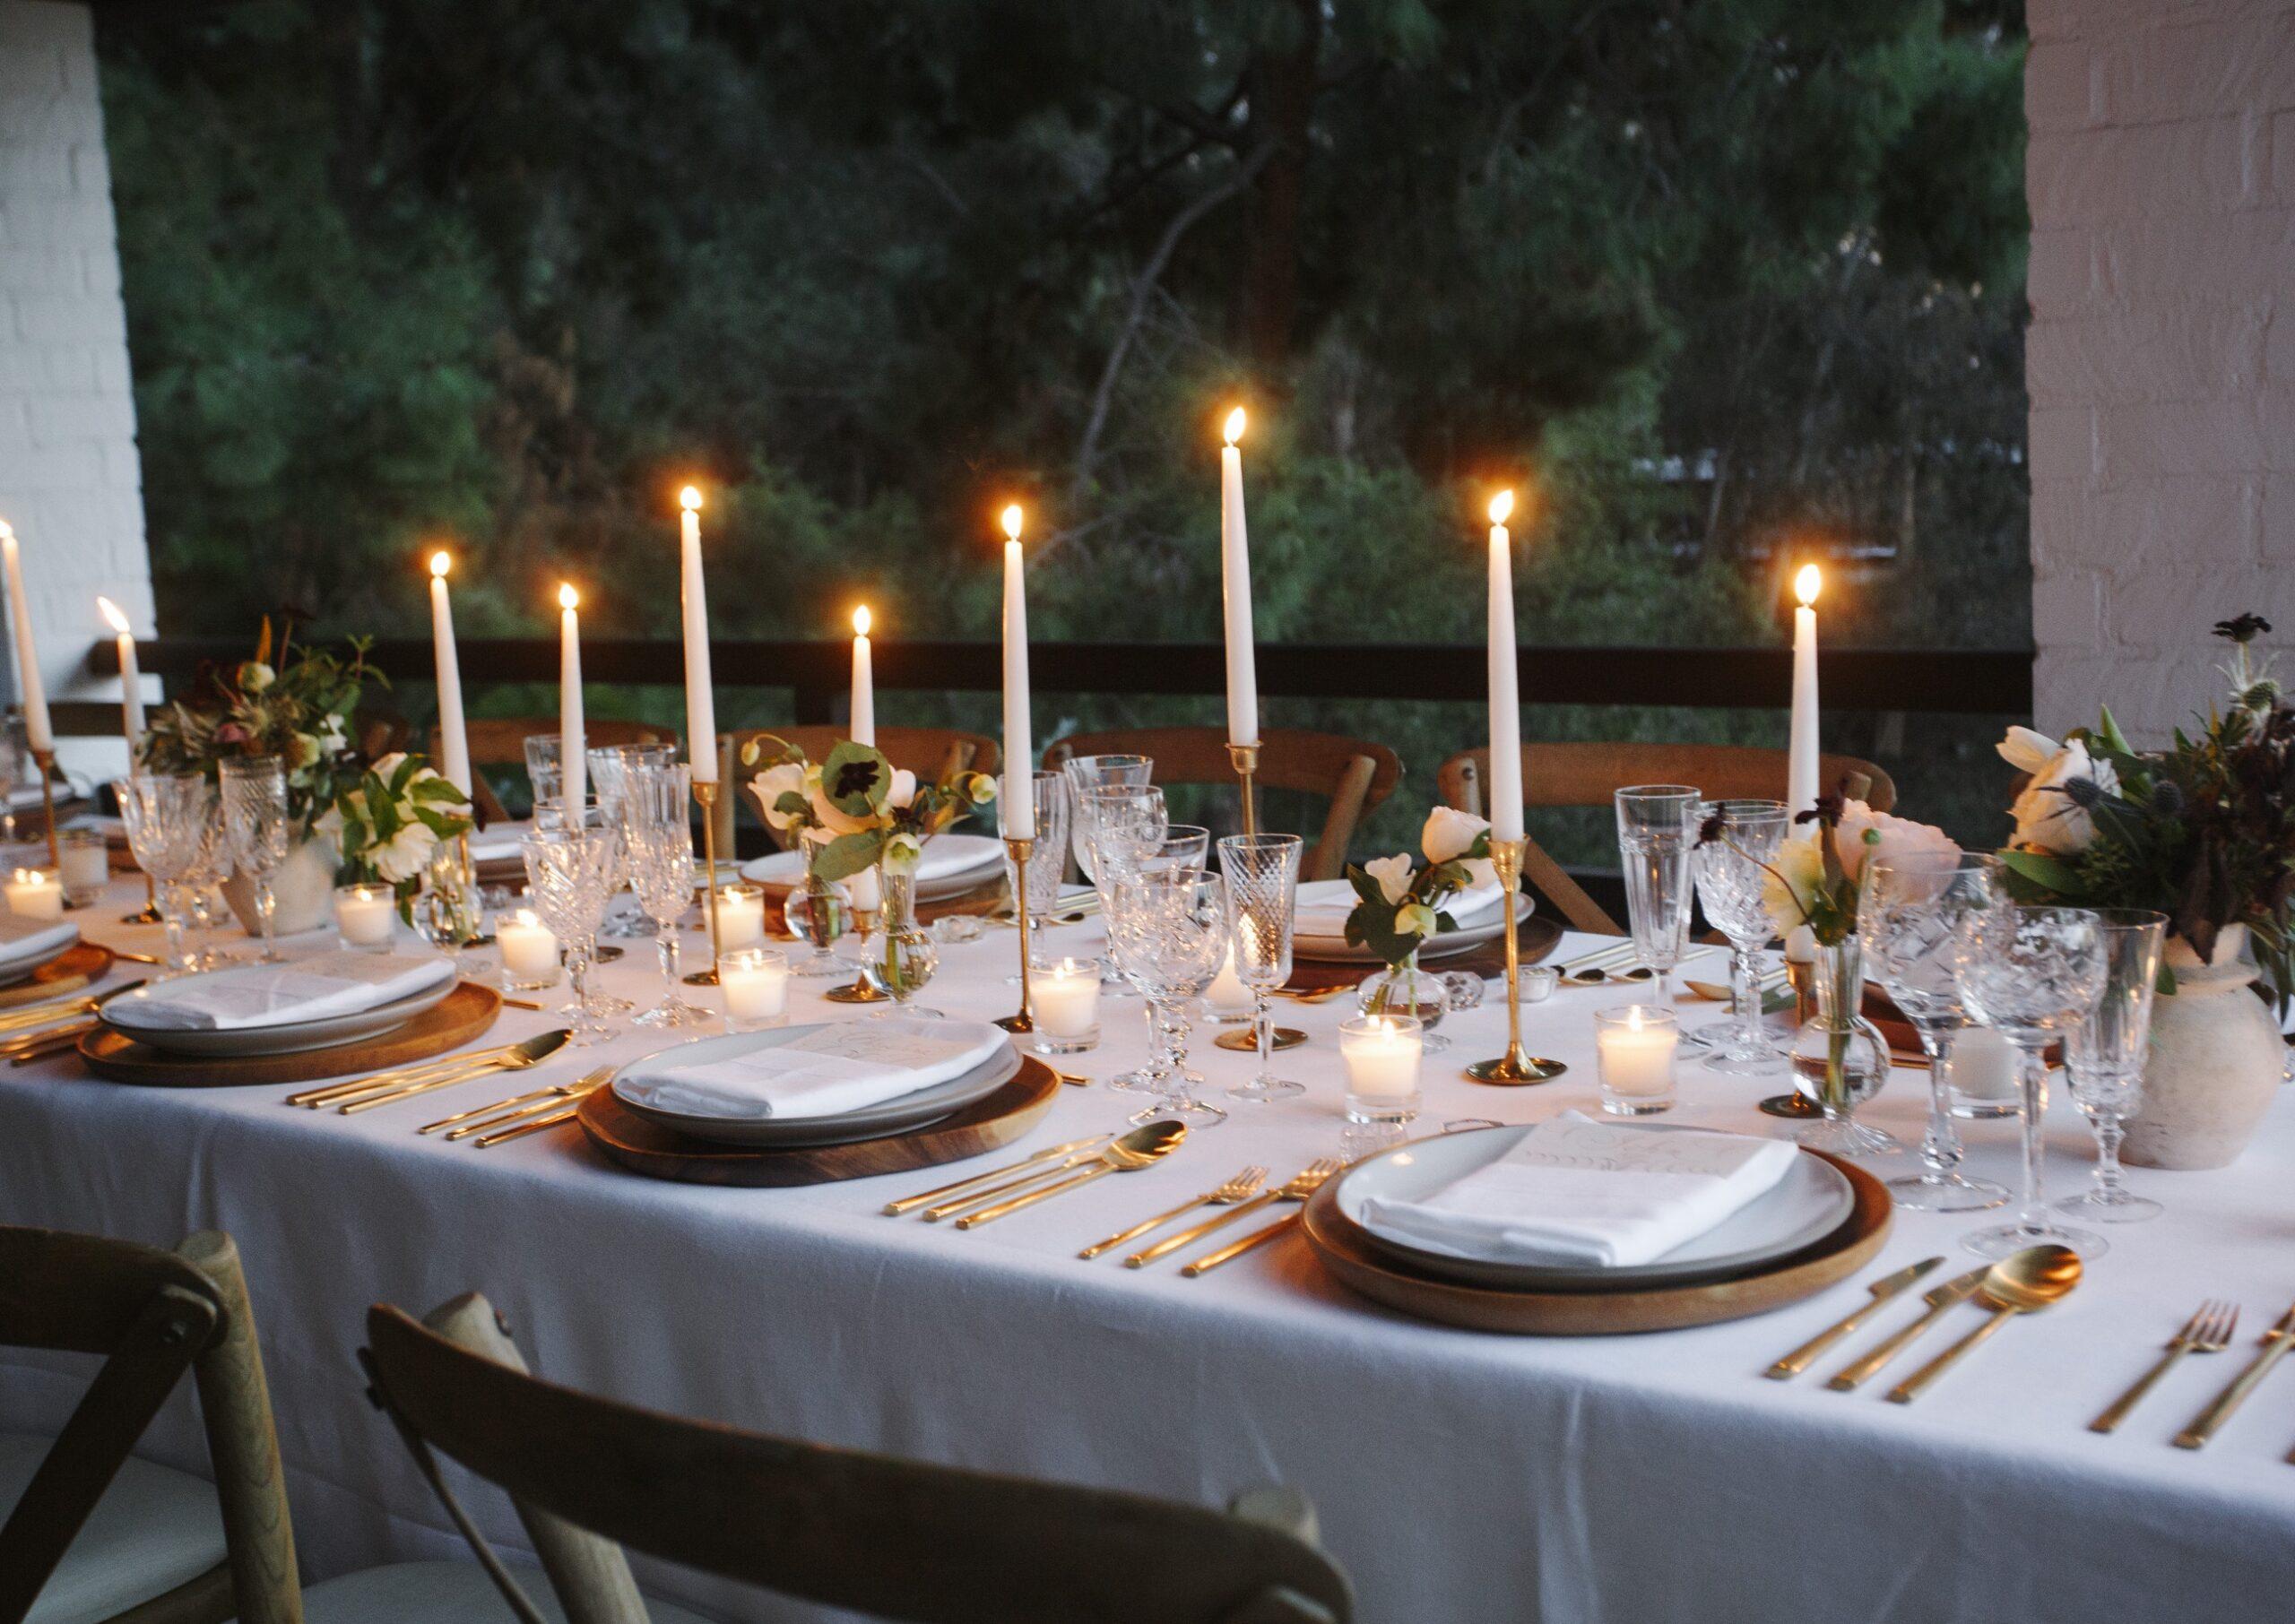 Candlelit Engagement Dinner